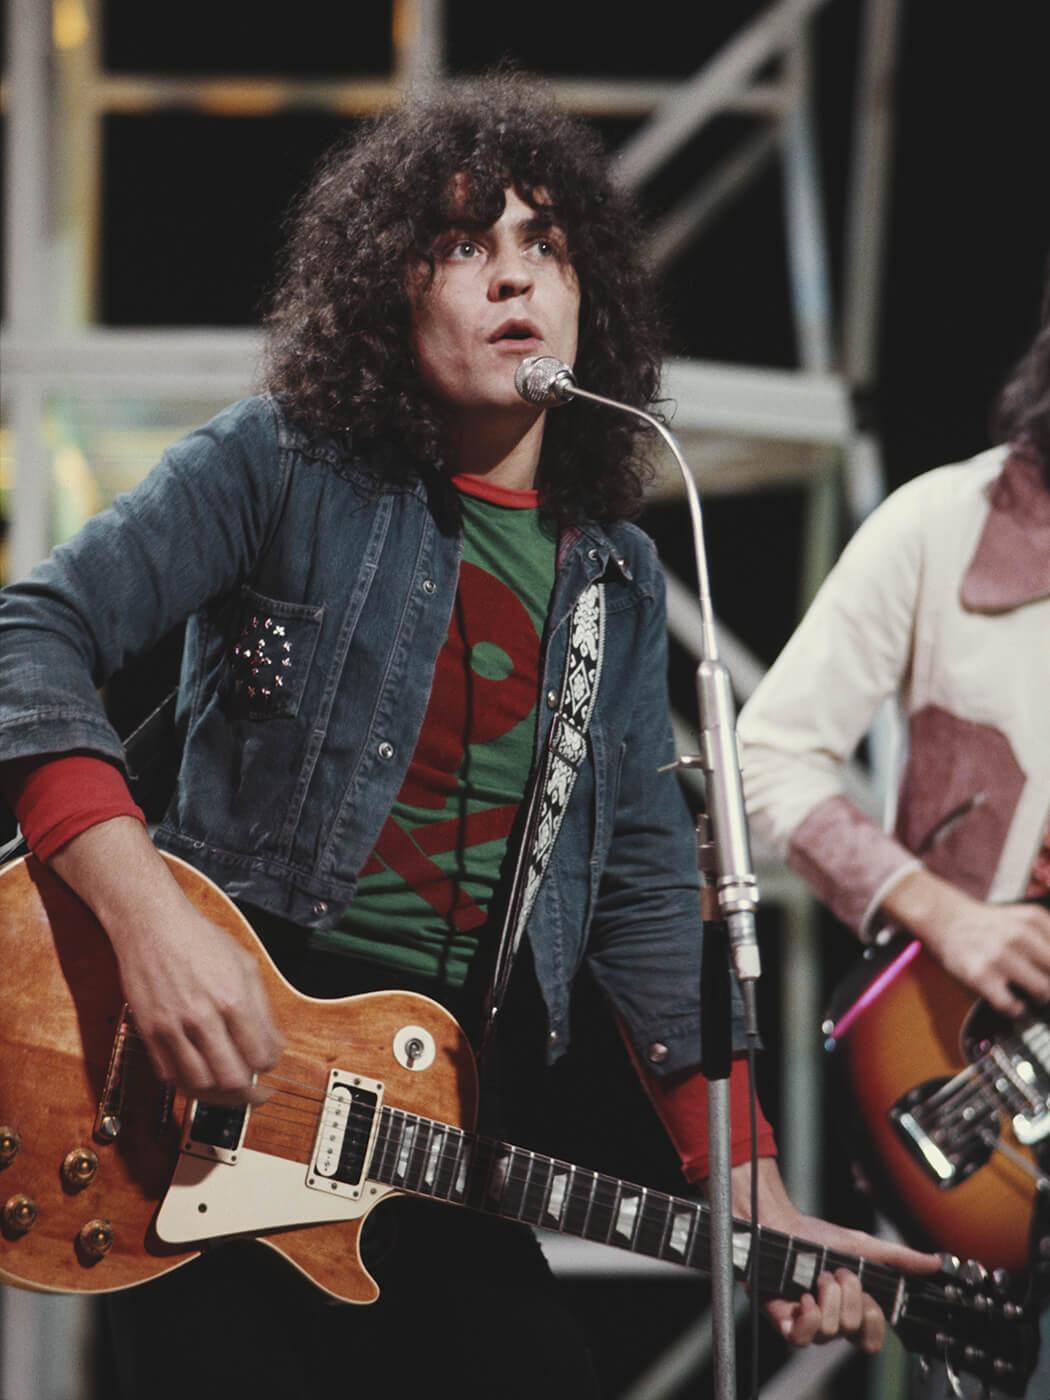 Marc Bolan of T. Rex